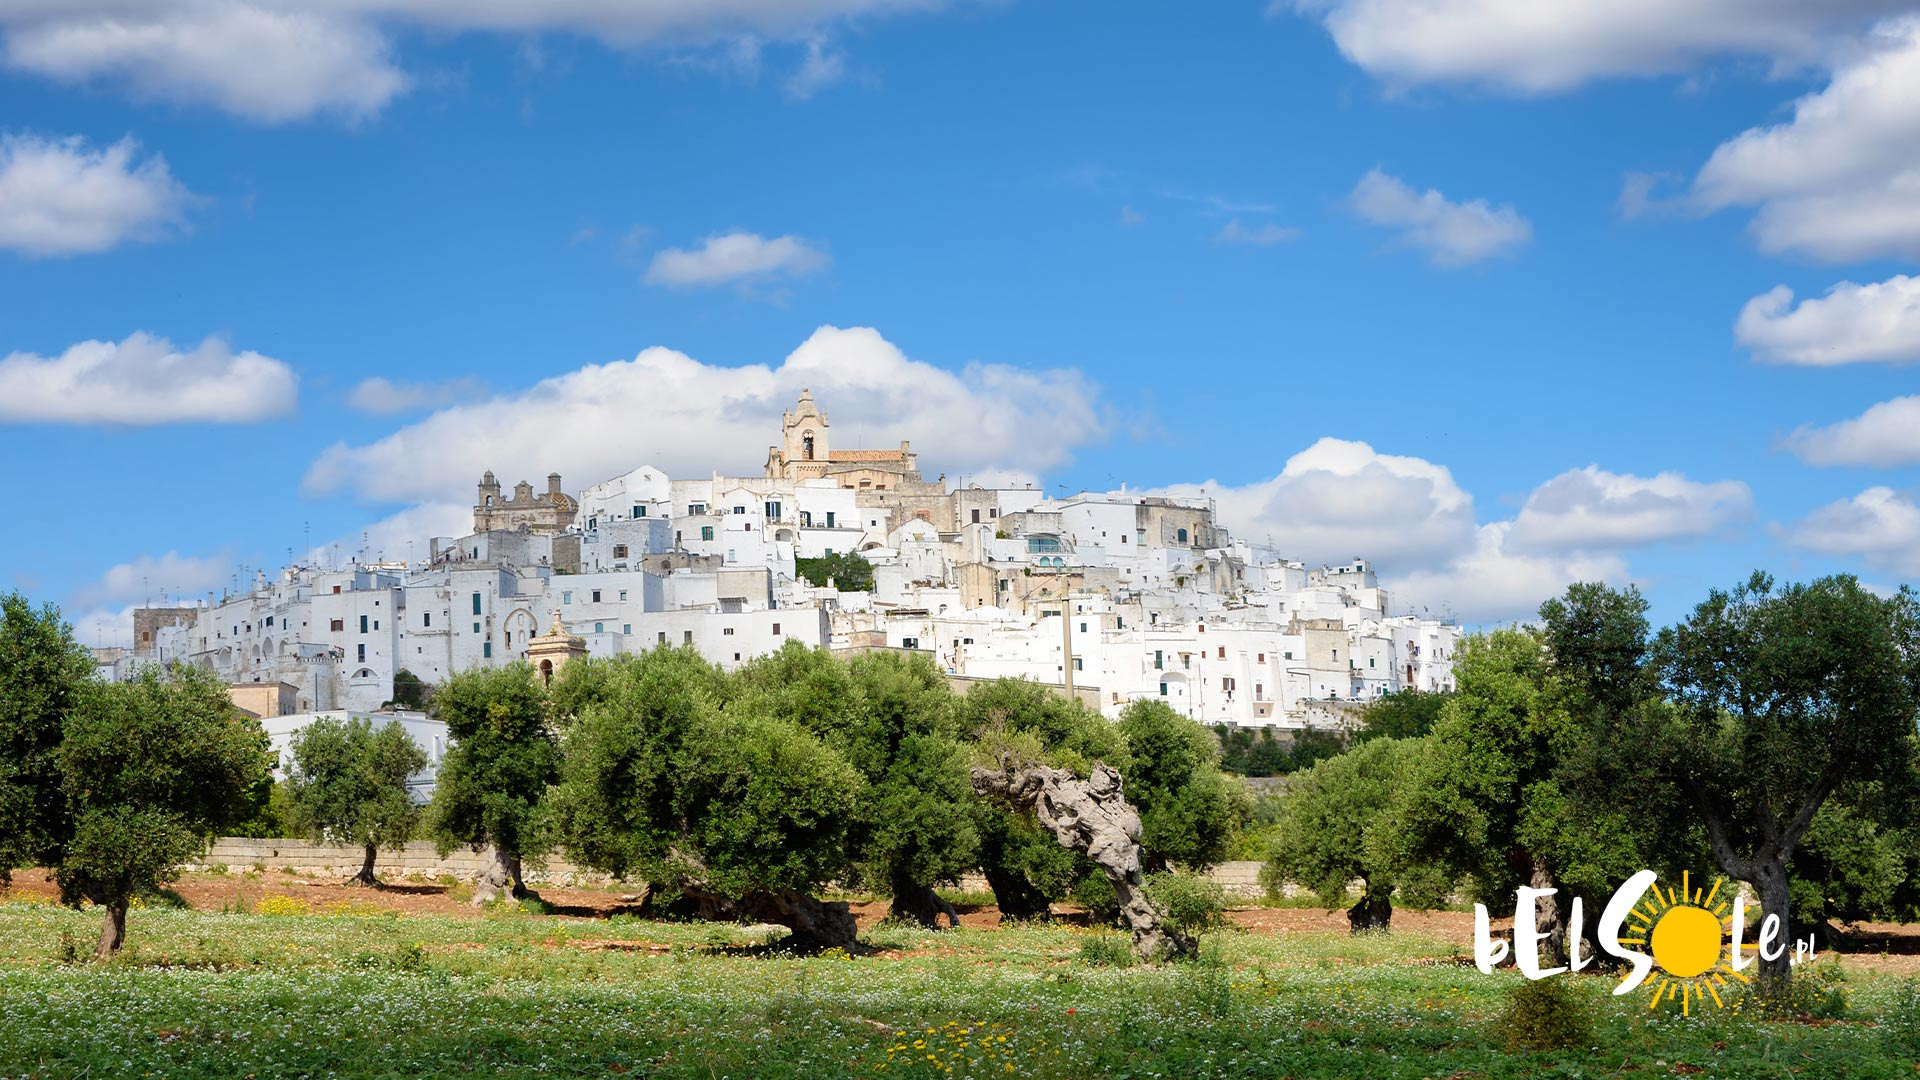 co kupić w Apulii i Bari